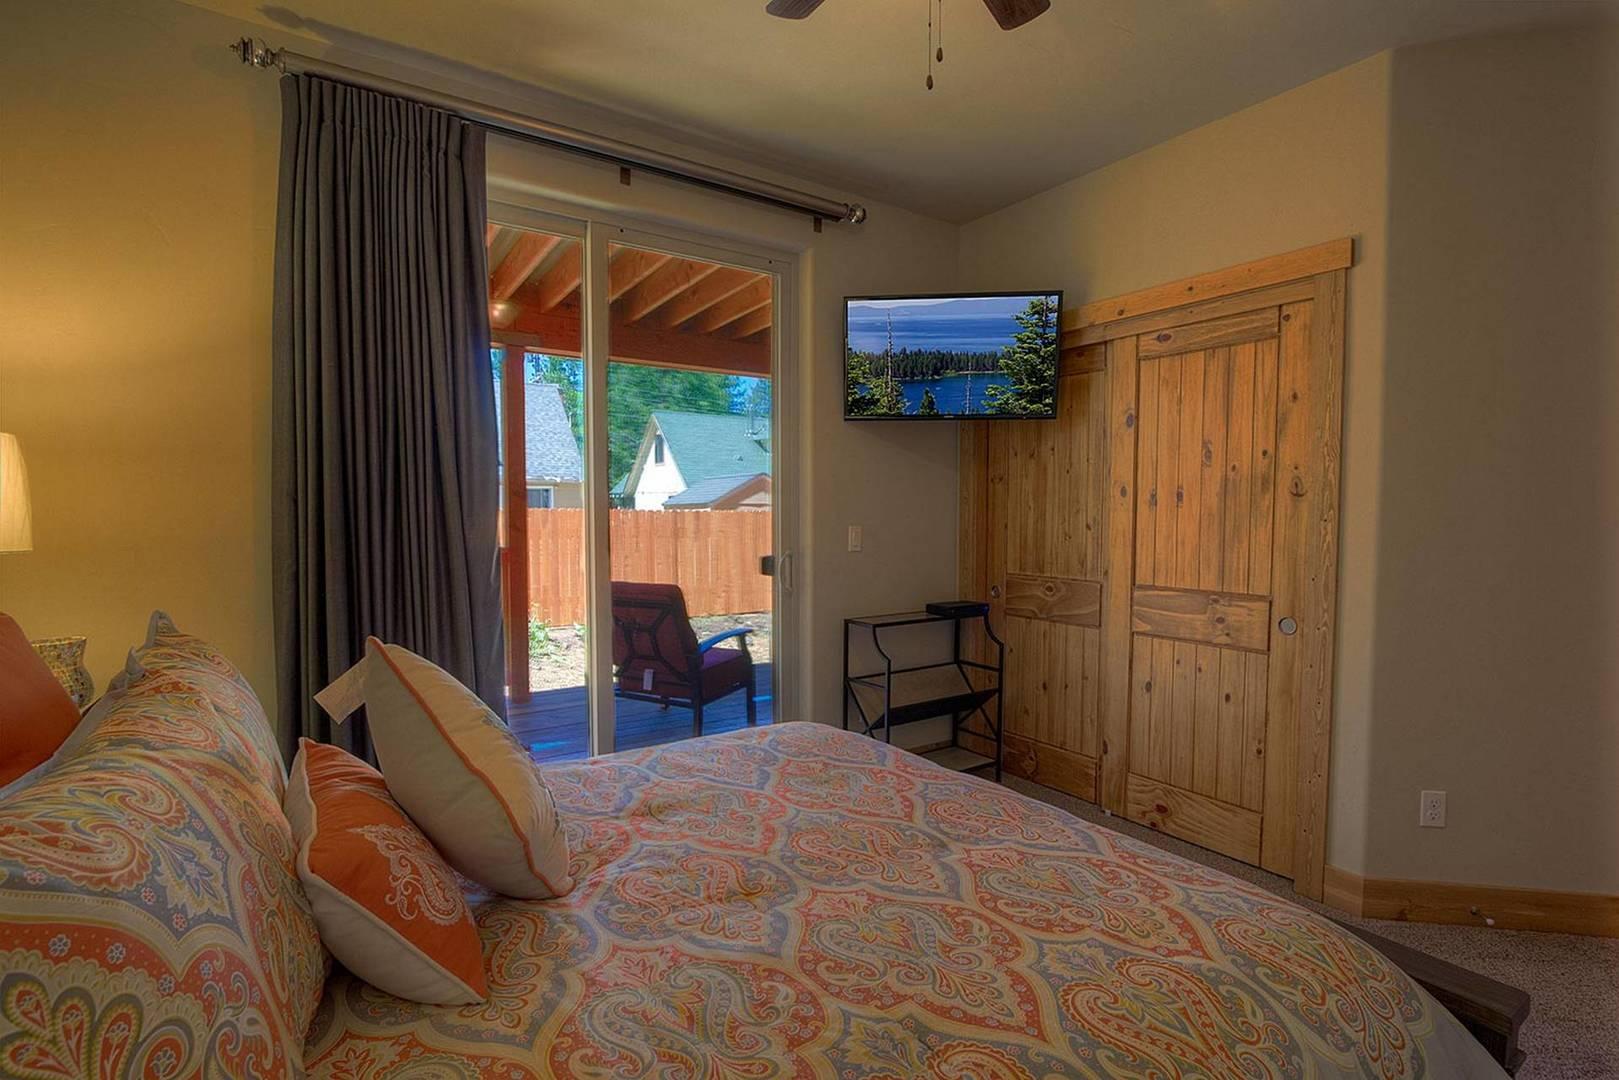 cyh1065 bedroom